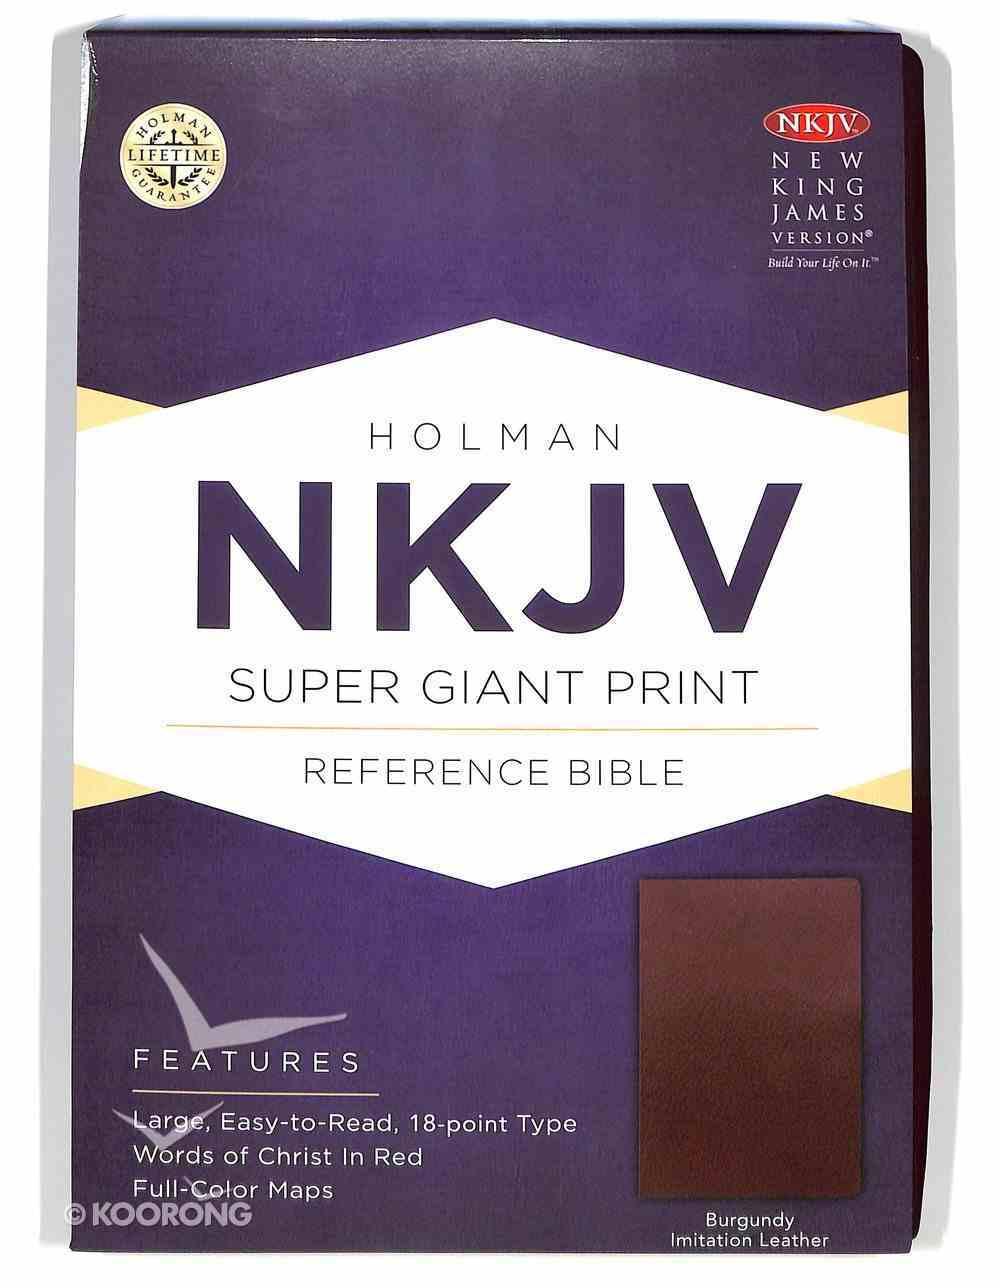 NKJV Super Giant Print Reference Bible Burgundy Imitation Leather